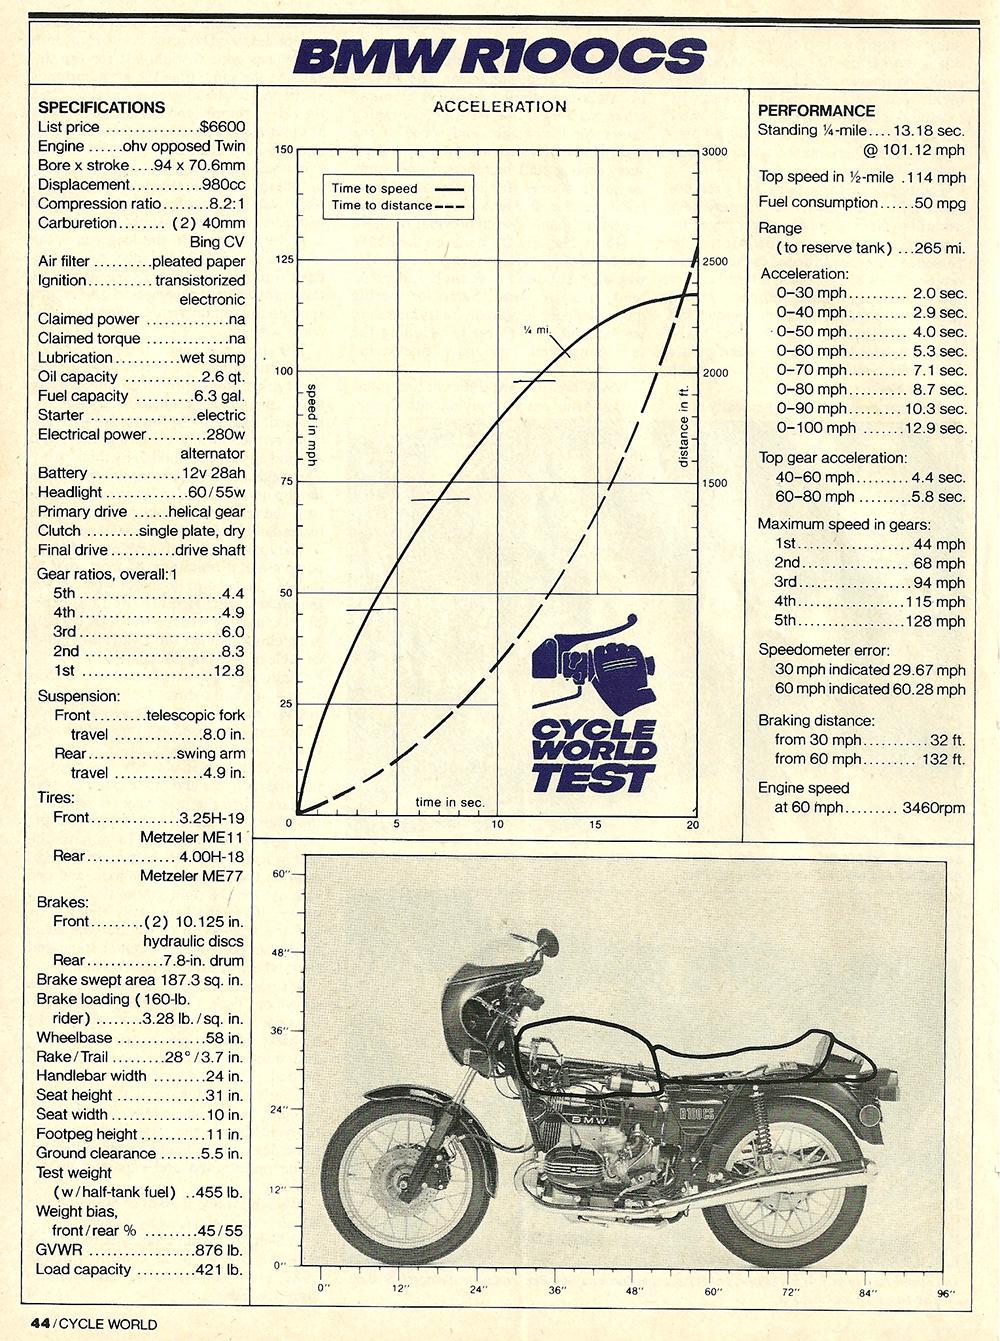 1981 BMW R100CS road test 7.jpg